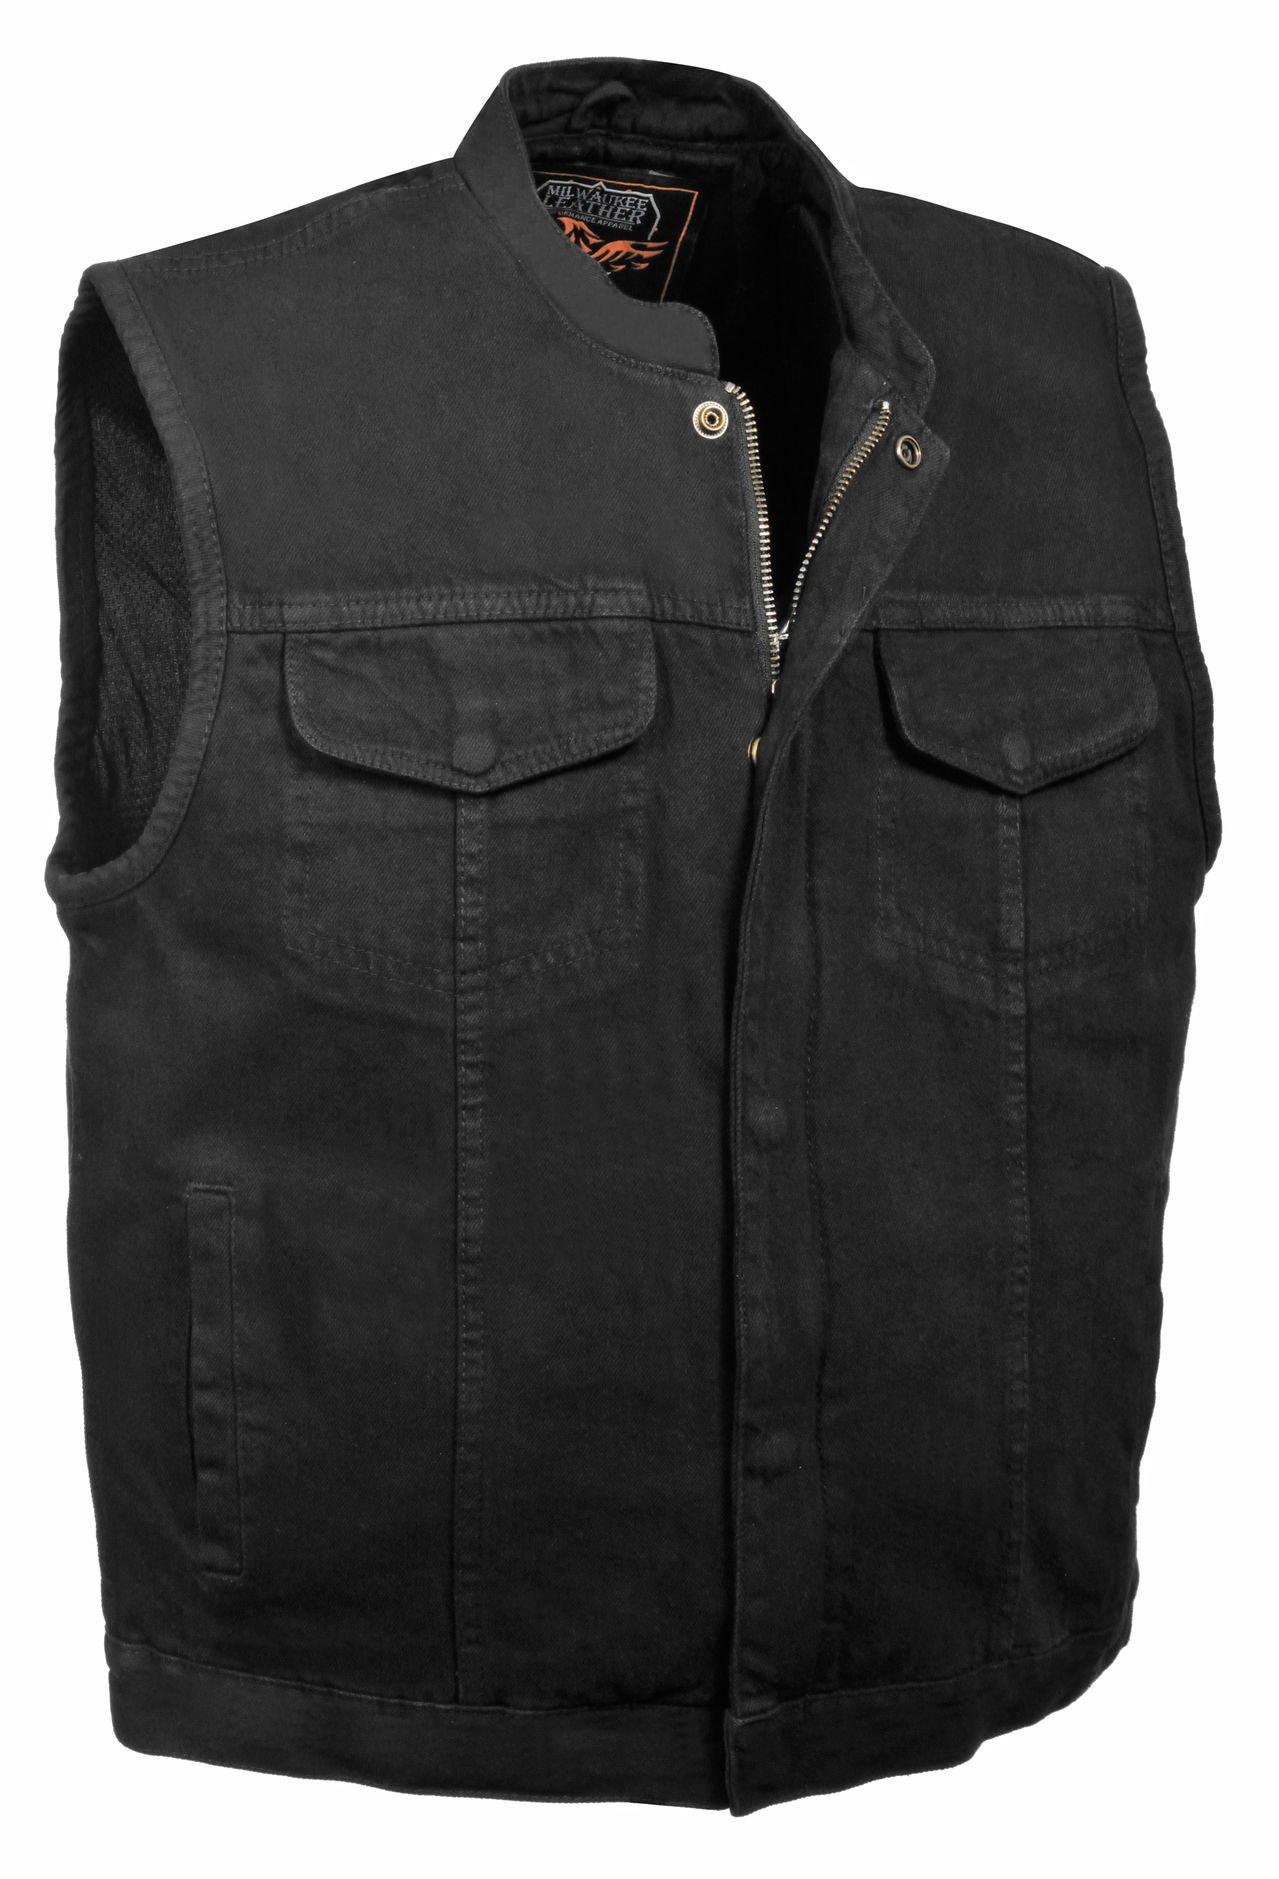 Men's Concealed Snap Denim Club Style Vest w/Hidden Zipper (Black, 3X) by Milwaukee Leather